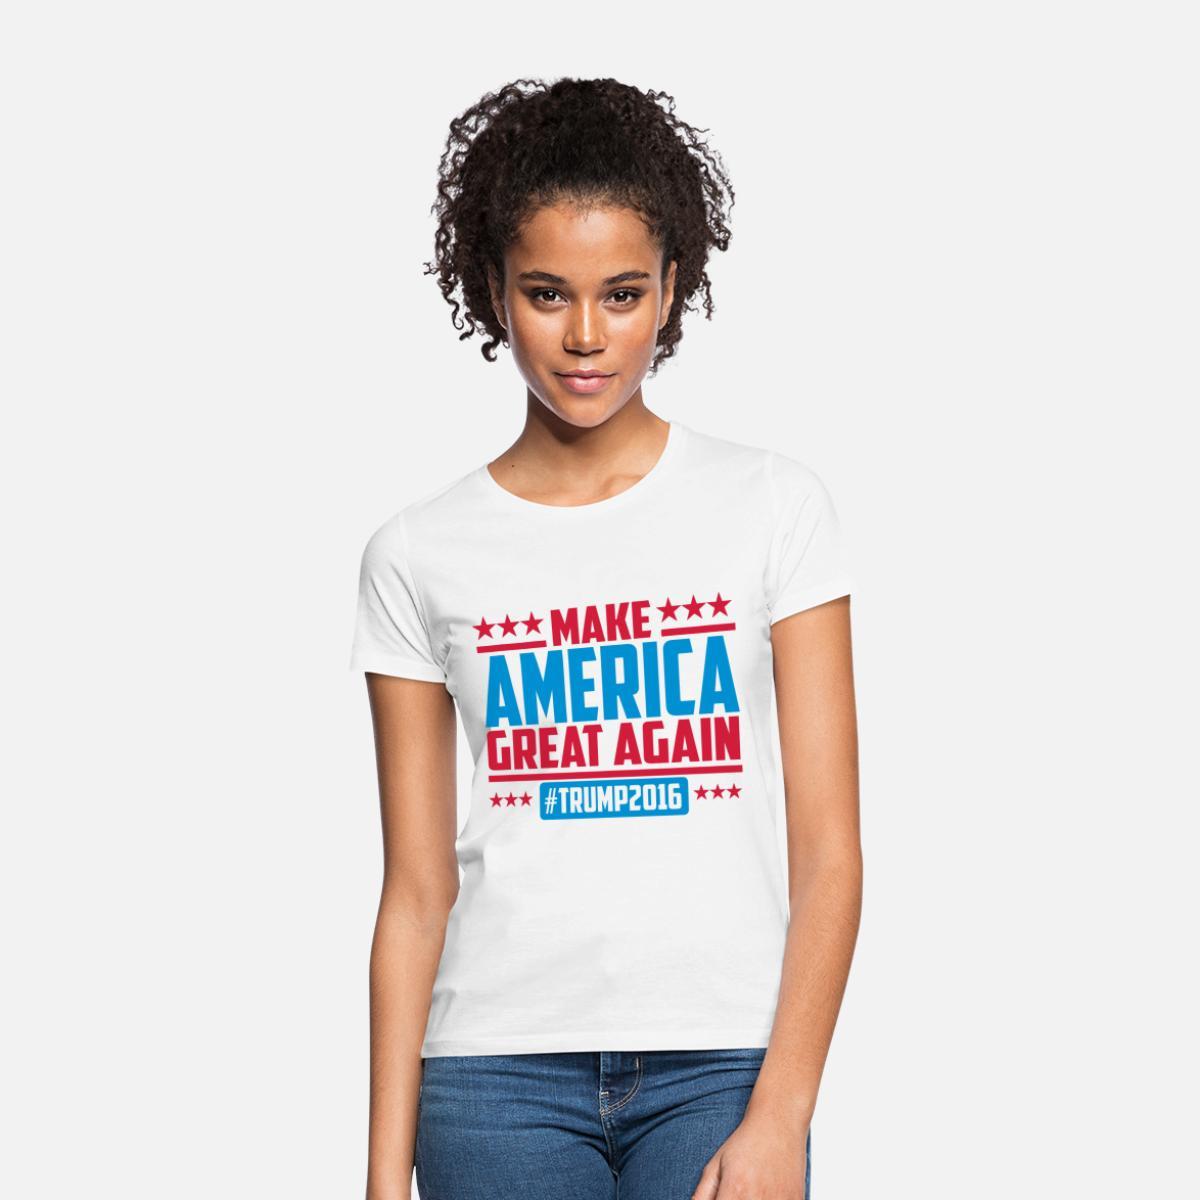 a48c6c3e Make america great again trump 2016 Camiseta mujer - blanco